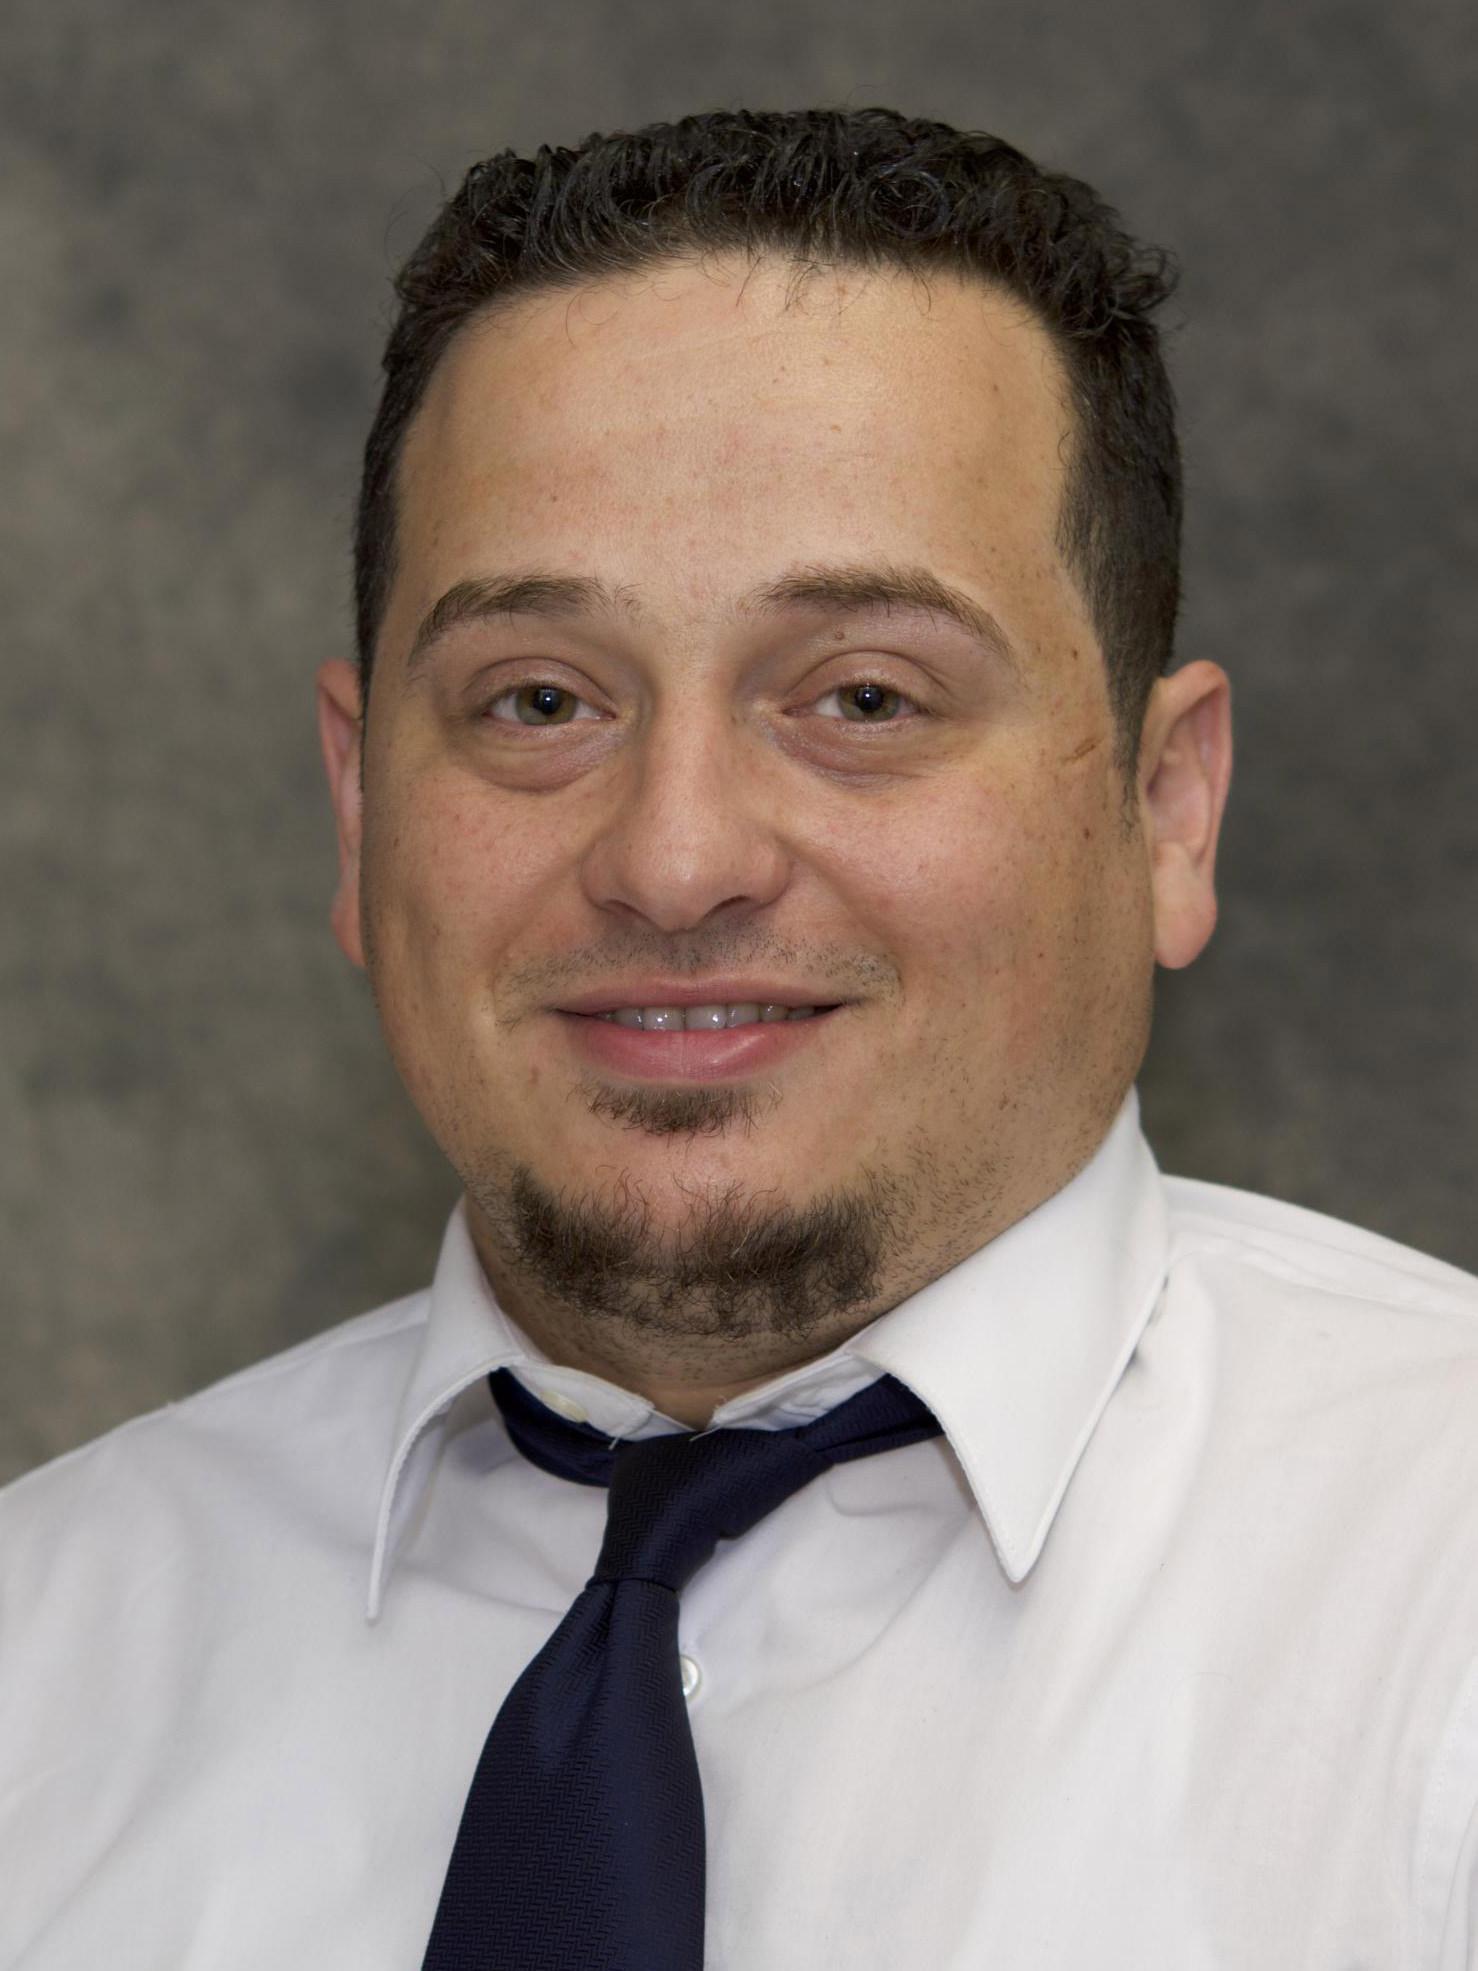 Hatem Kaseb, M.D., Ph.D., M.P.H.